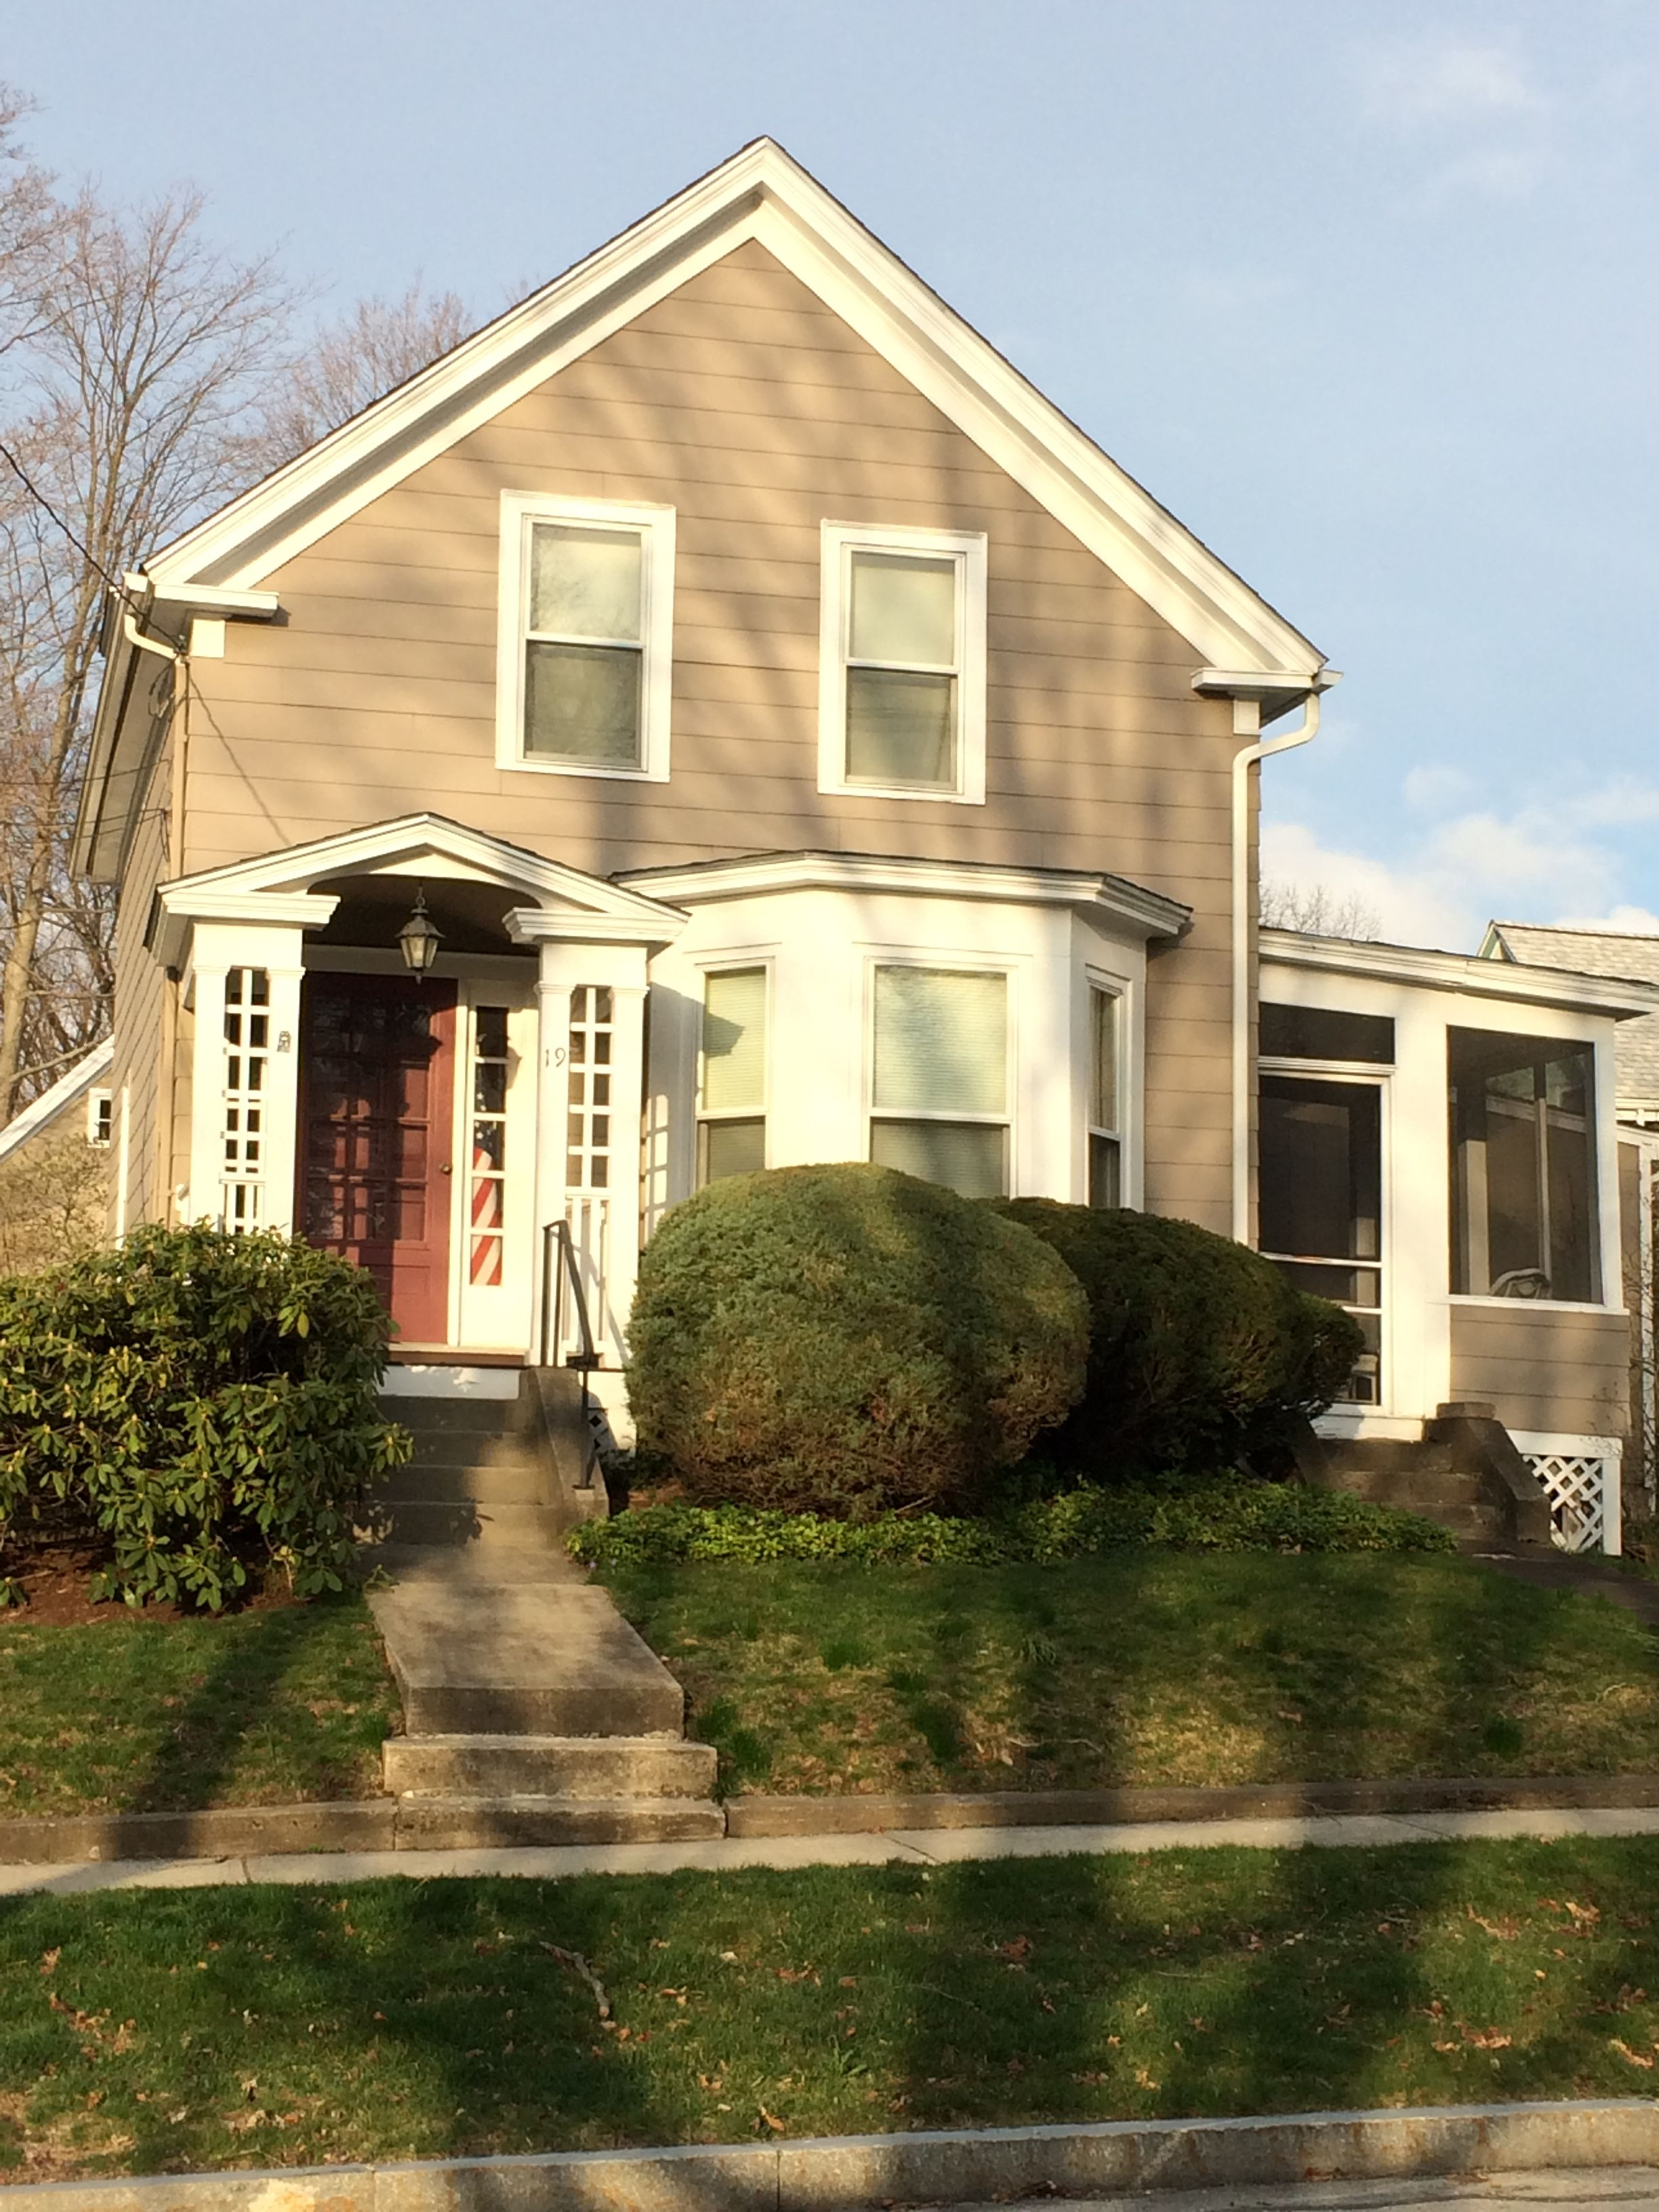 Asbestos Siding Historic Homes Westborough Ma Historic Homes House Styles New Homes